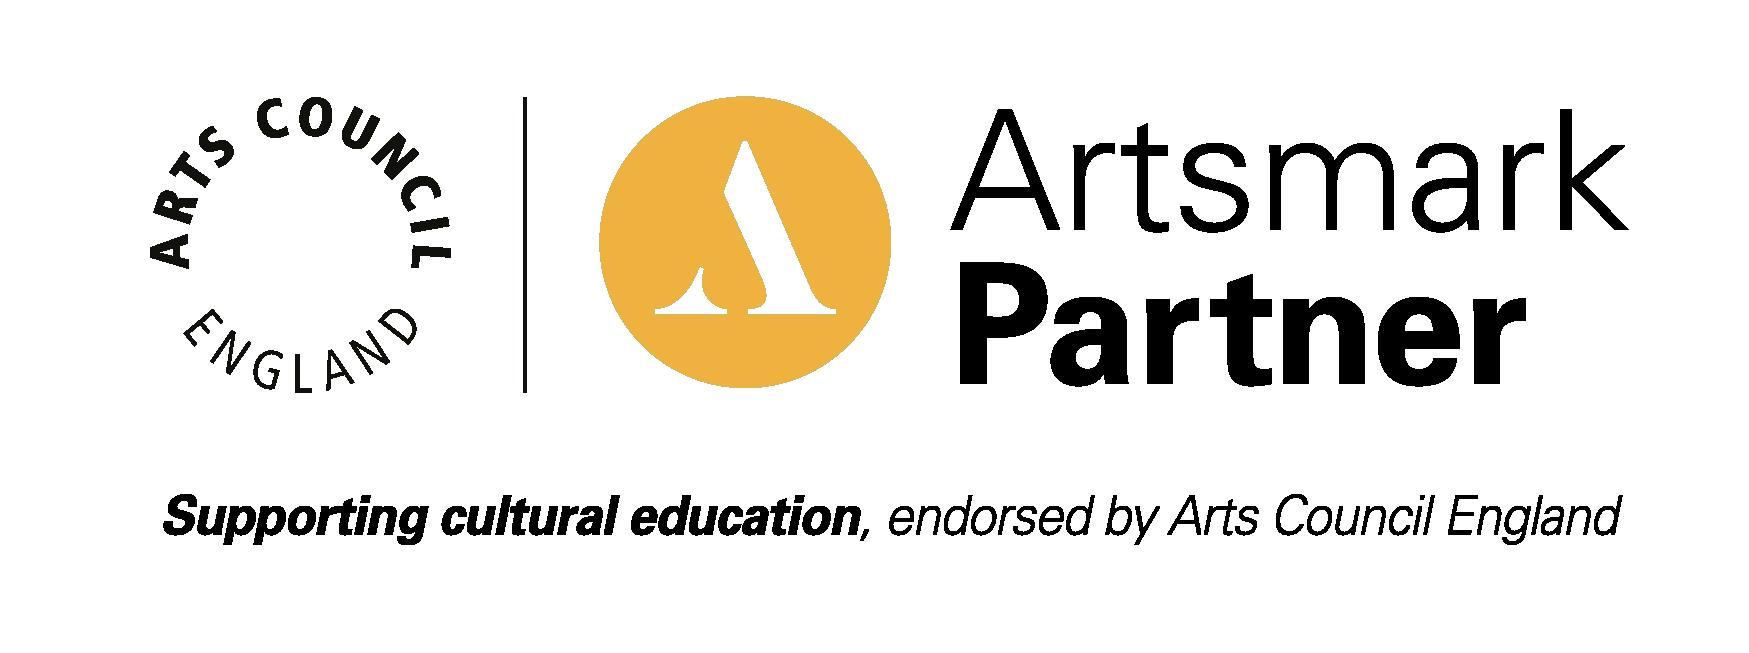 artsmark yellow-01.png